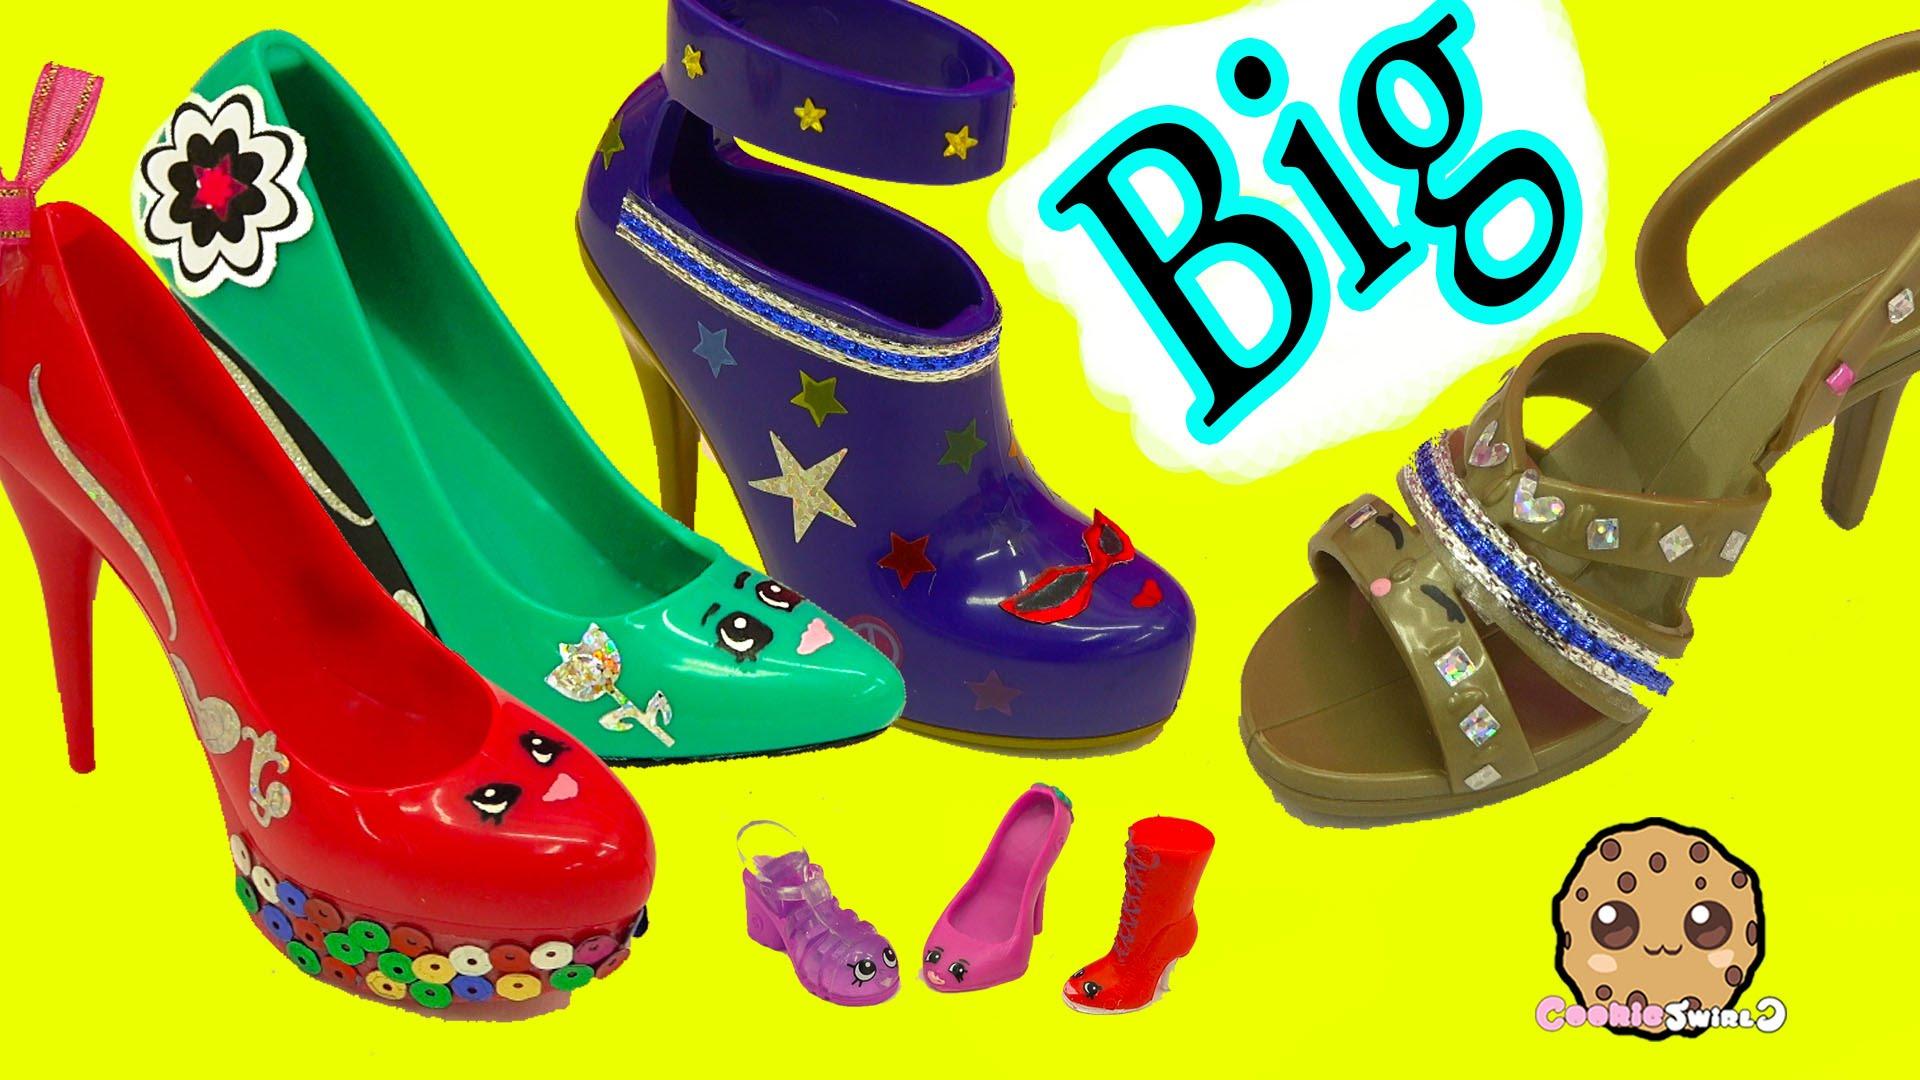 Big clipart big shoe. Painting designing large shopkins